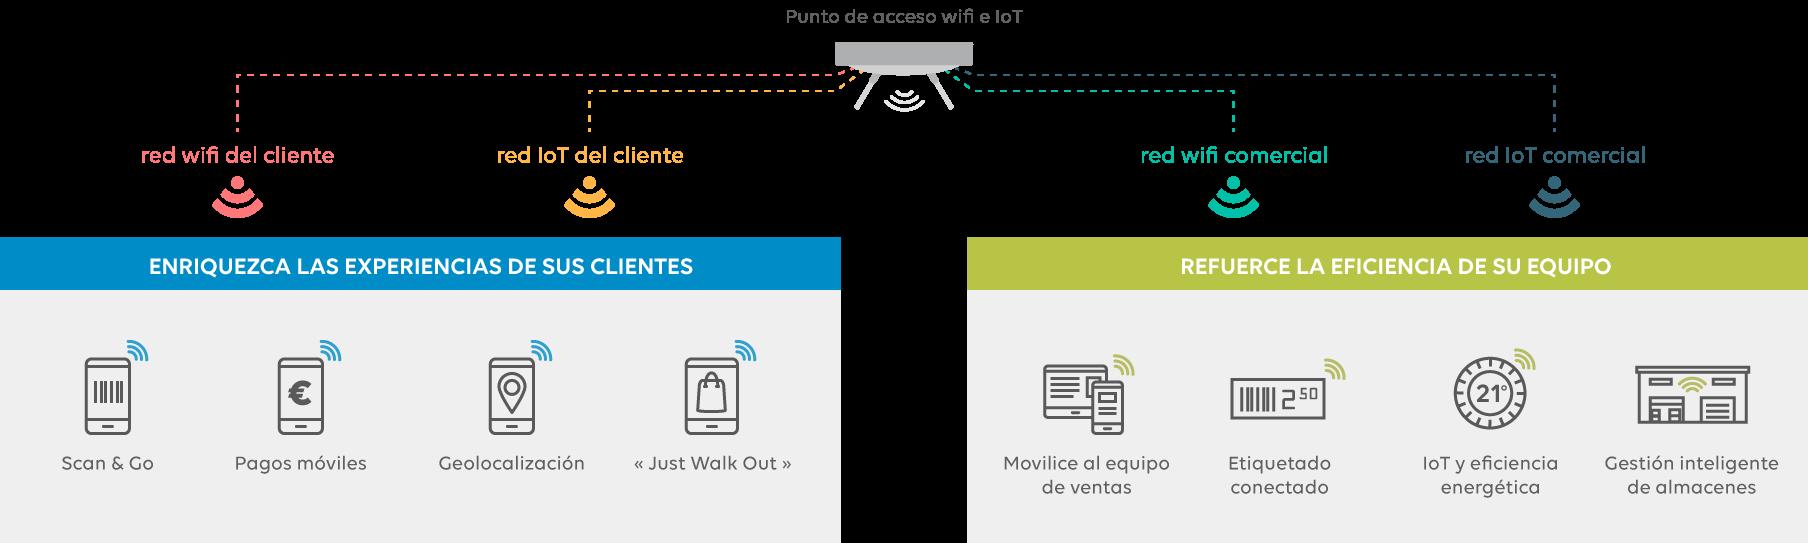 Infraestructura con varias redes WiFi e IoT en un negocio